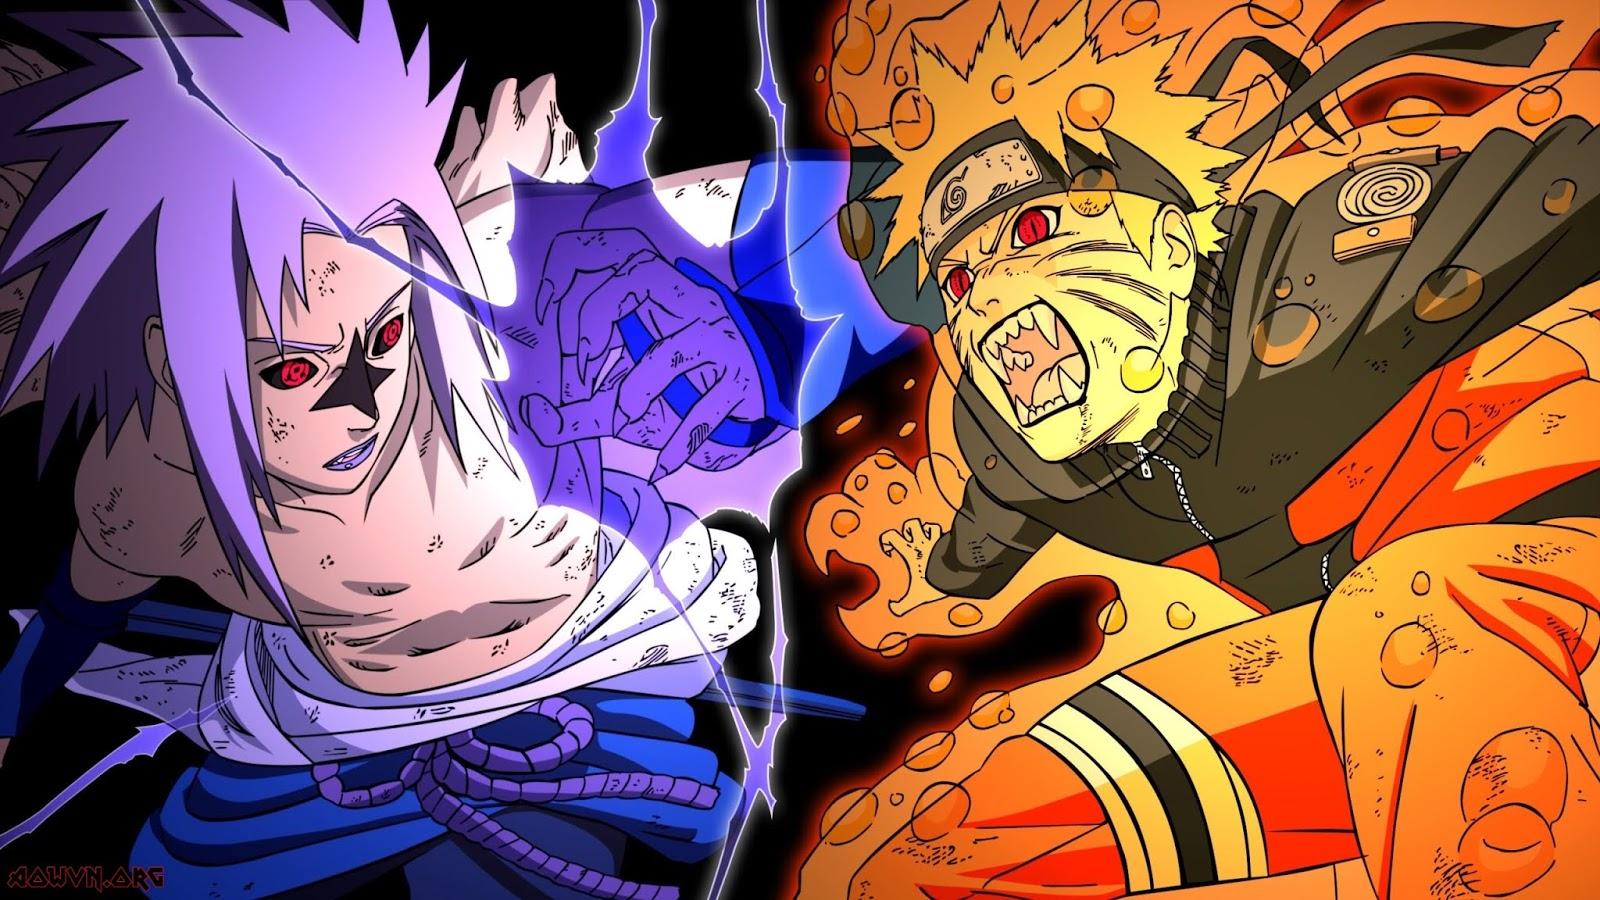 maxresdefault - [ Anime 3gp Mp4 | Ep 130 ] Naruto Dattebayo | Vietsub - Bầu trời tuổi thơ!!